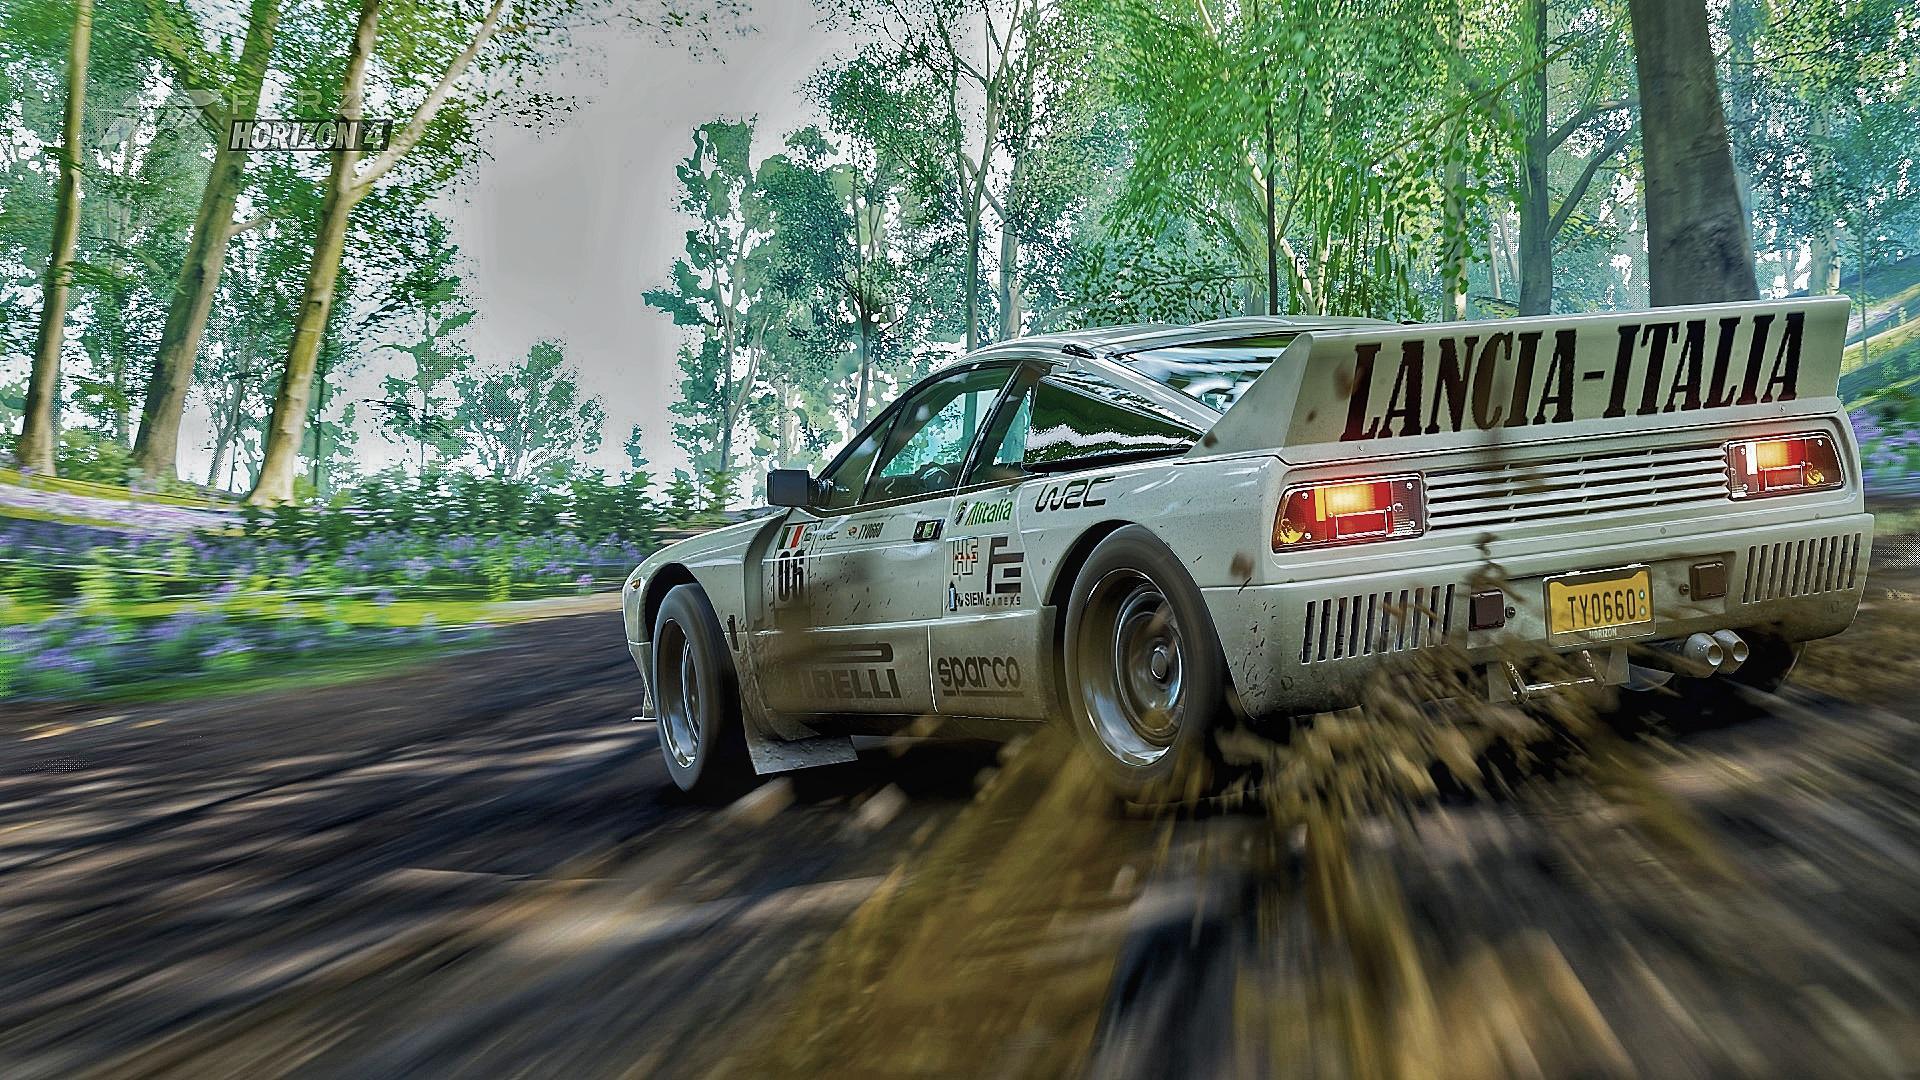 lancia vas Ο άνθρωπος που αναλαμβάνει την αναγέννηση της Lancia Lancia, Lancia Delta Integralle, zblog